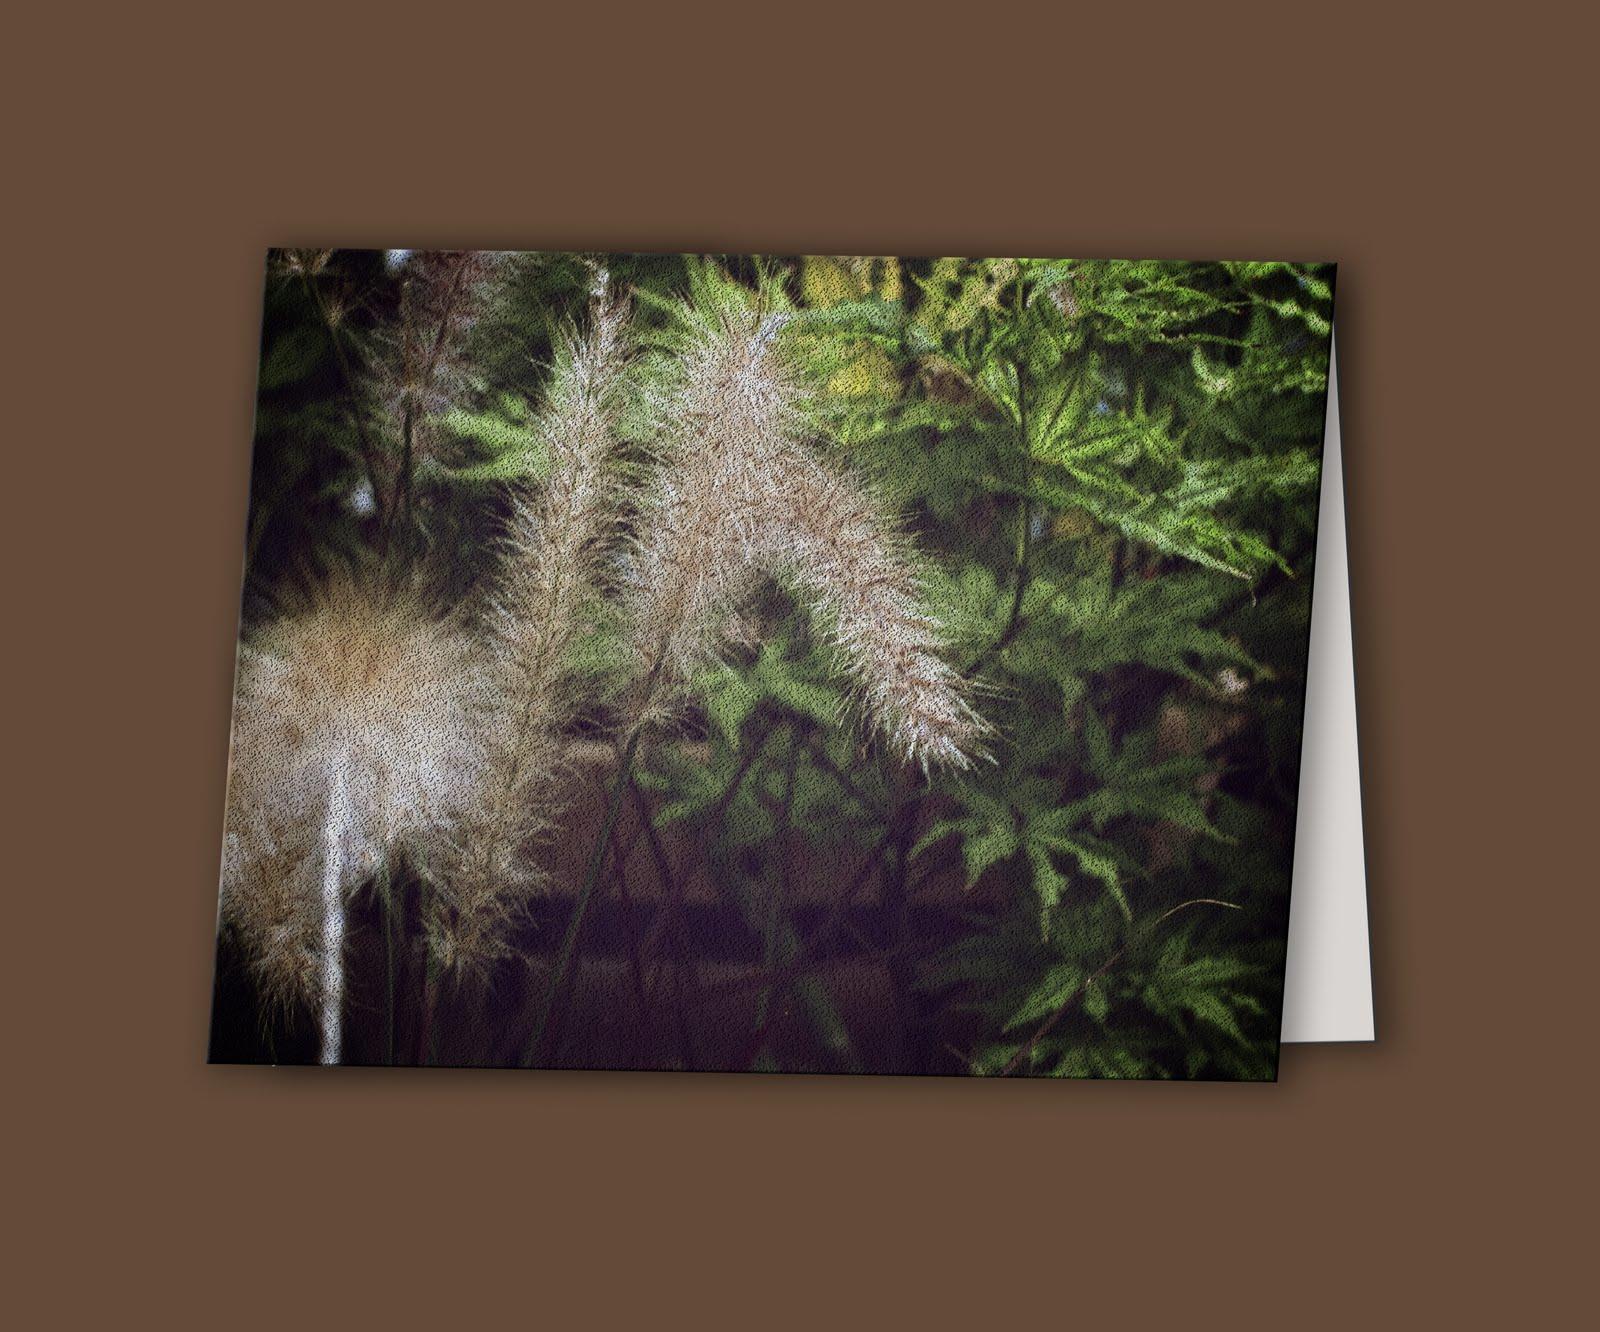 http://4.bp.blogspot.com/-WzZqI-YMi_g/TaMEWoRyhgI/AAAAAAAABeo/wYWYxCuAMBg/s1600/fountain+grass+card.jpg